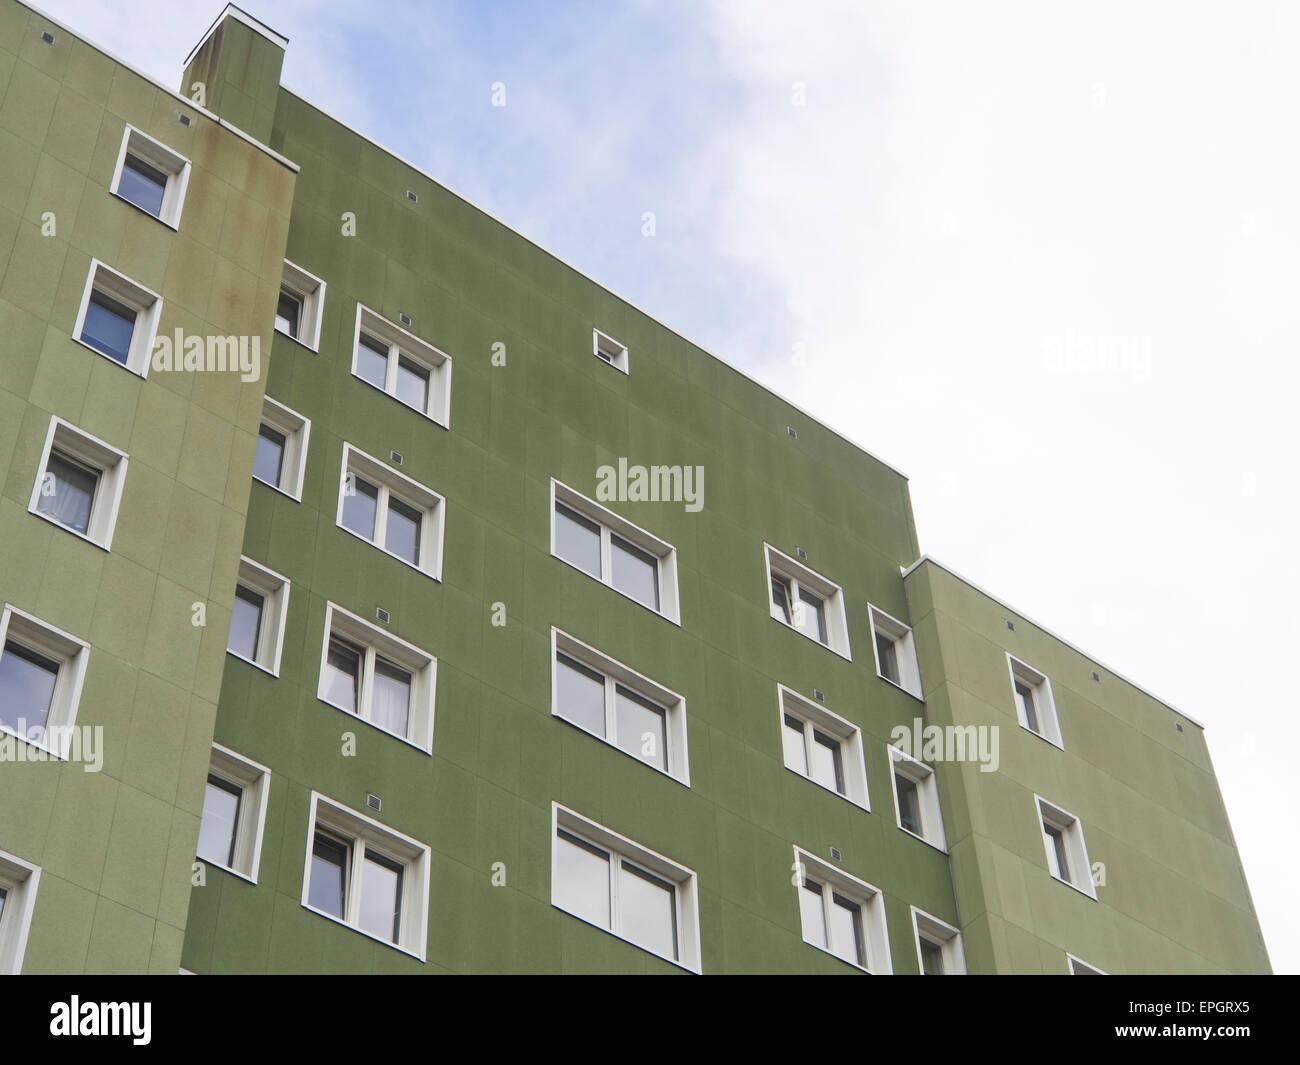 White Window Frames Stockfotos & White Window Frames Bilder - Alamy